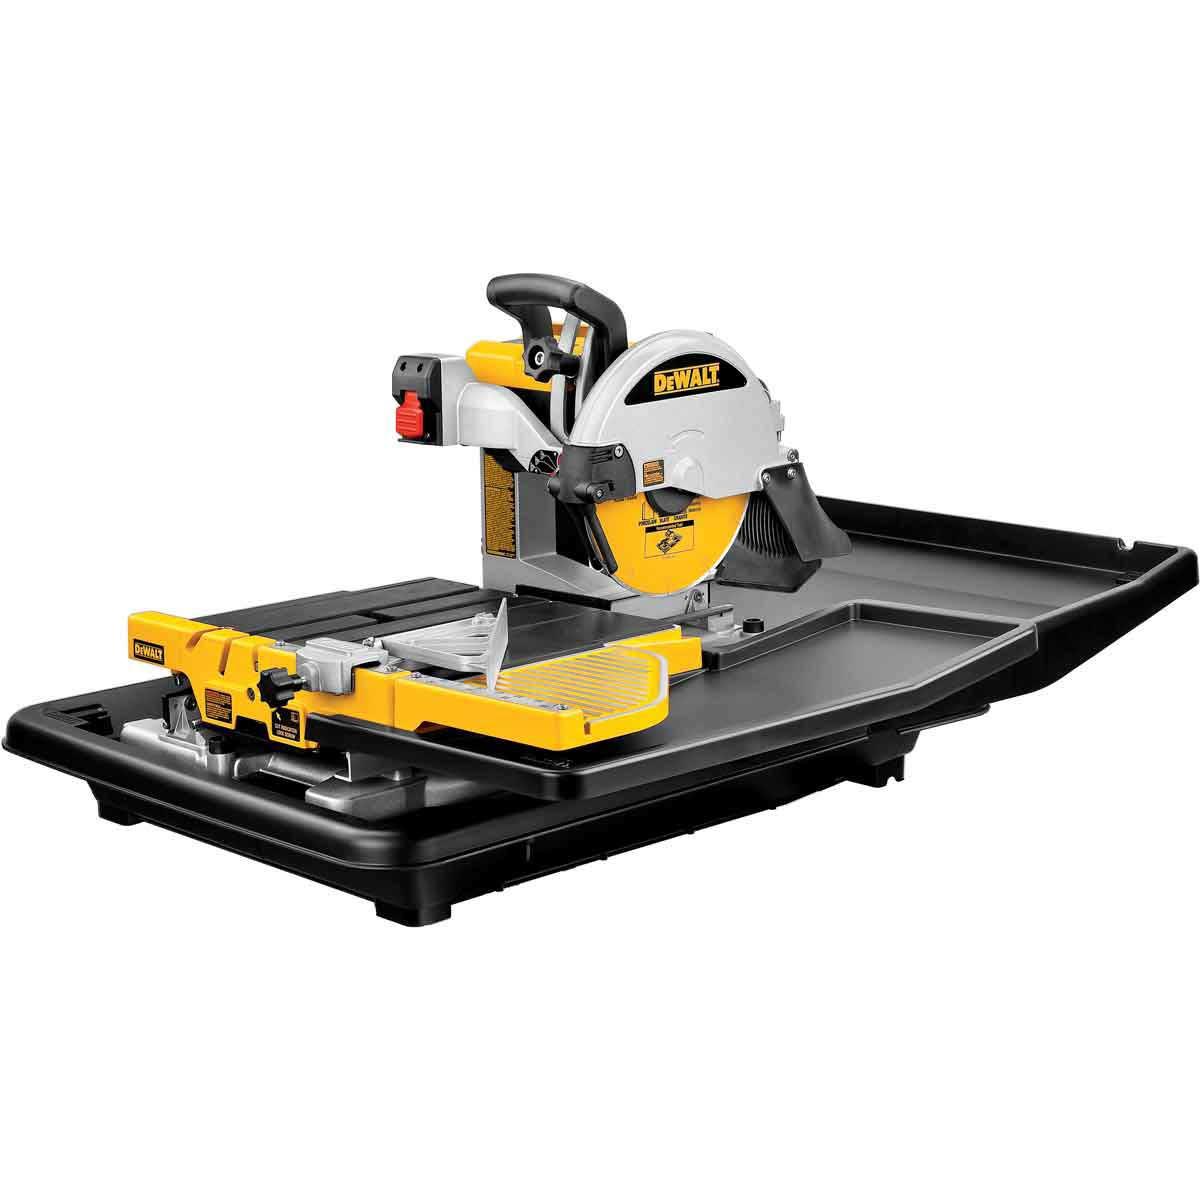 Dewalt D24000 wet tile saw